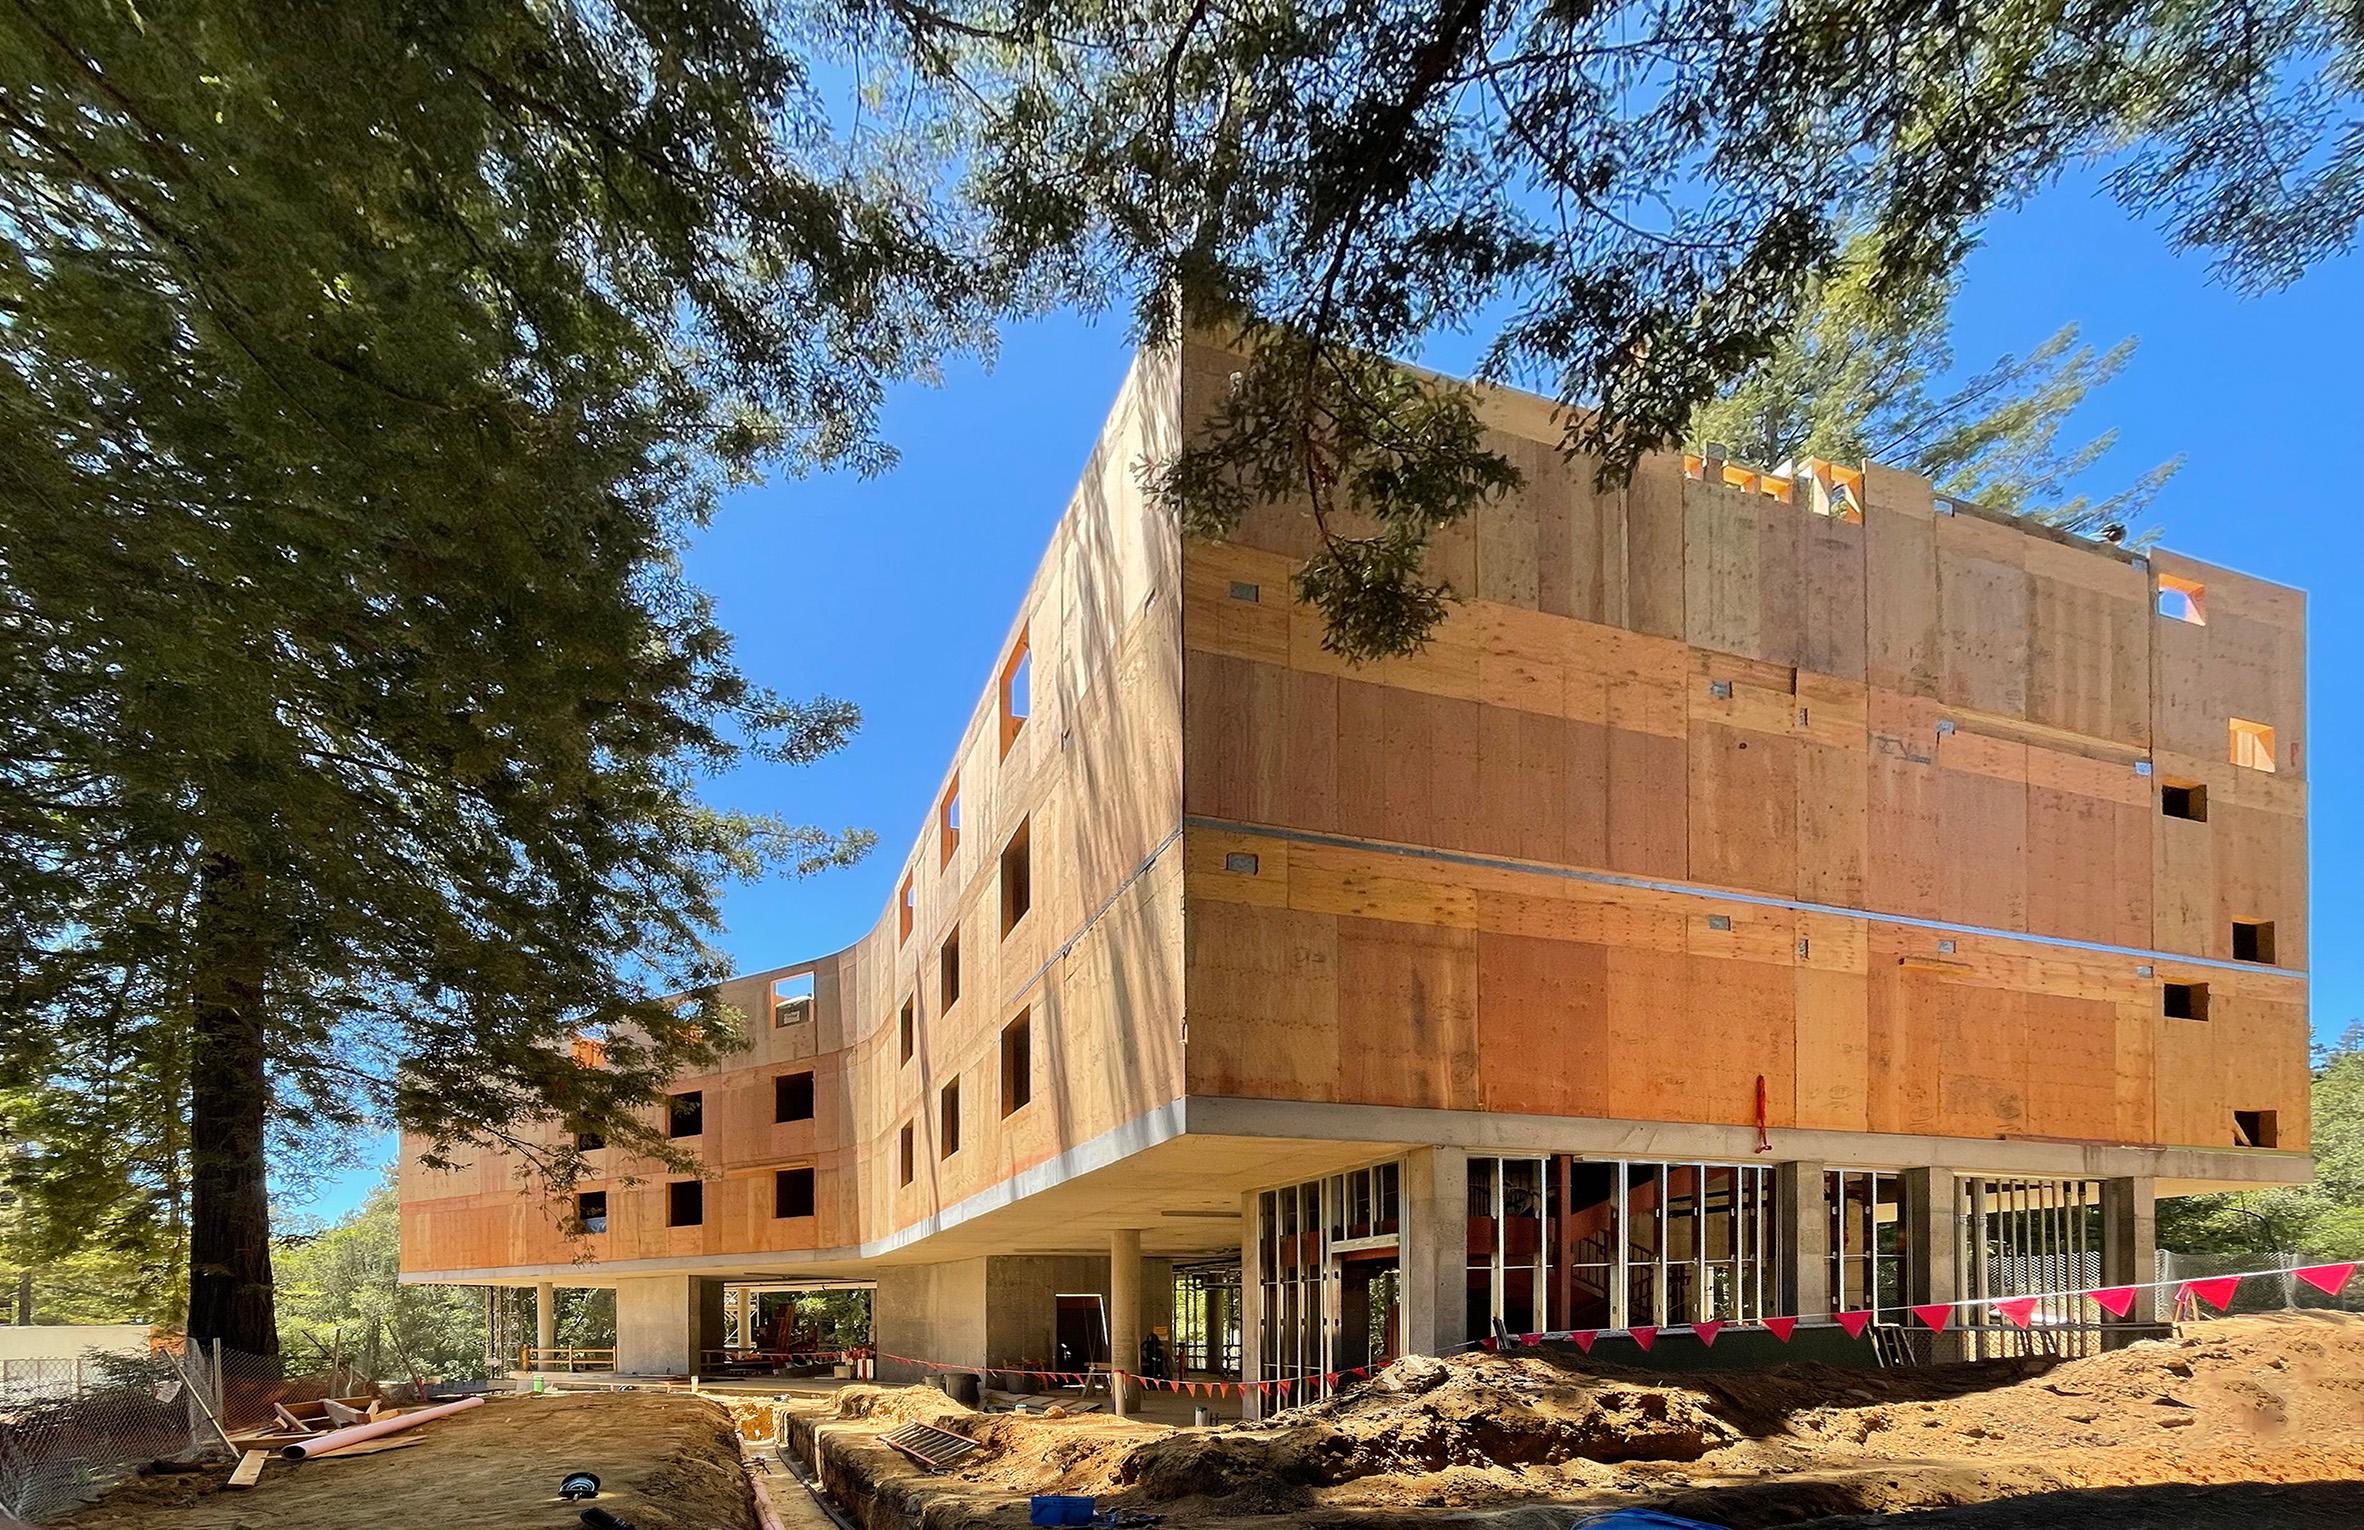 UC Santa Cruz Kresge College Mass Timber Residence Halls Under Construction